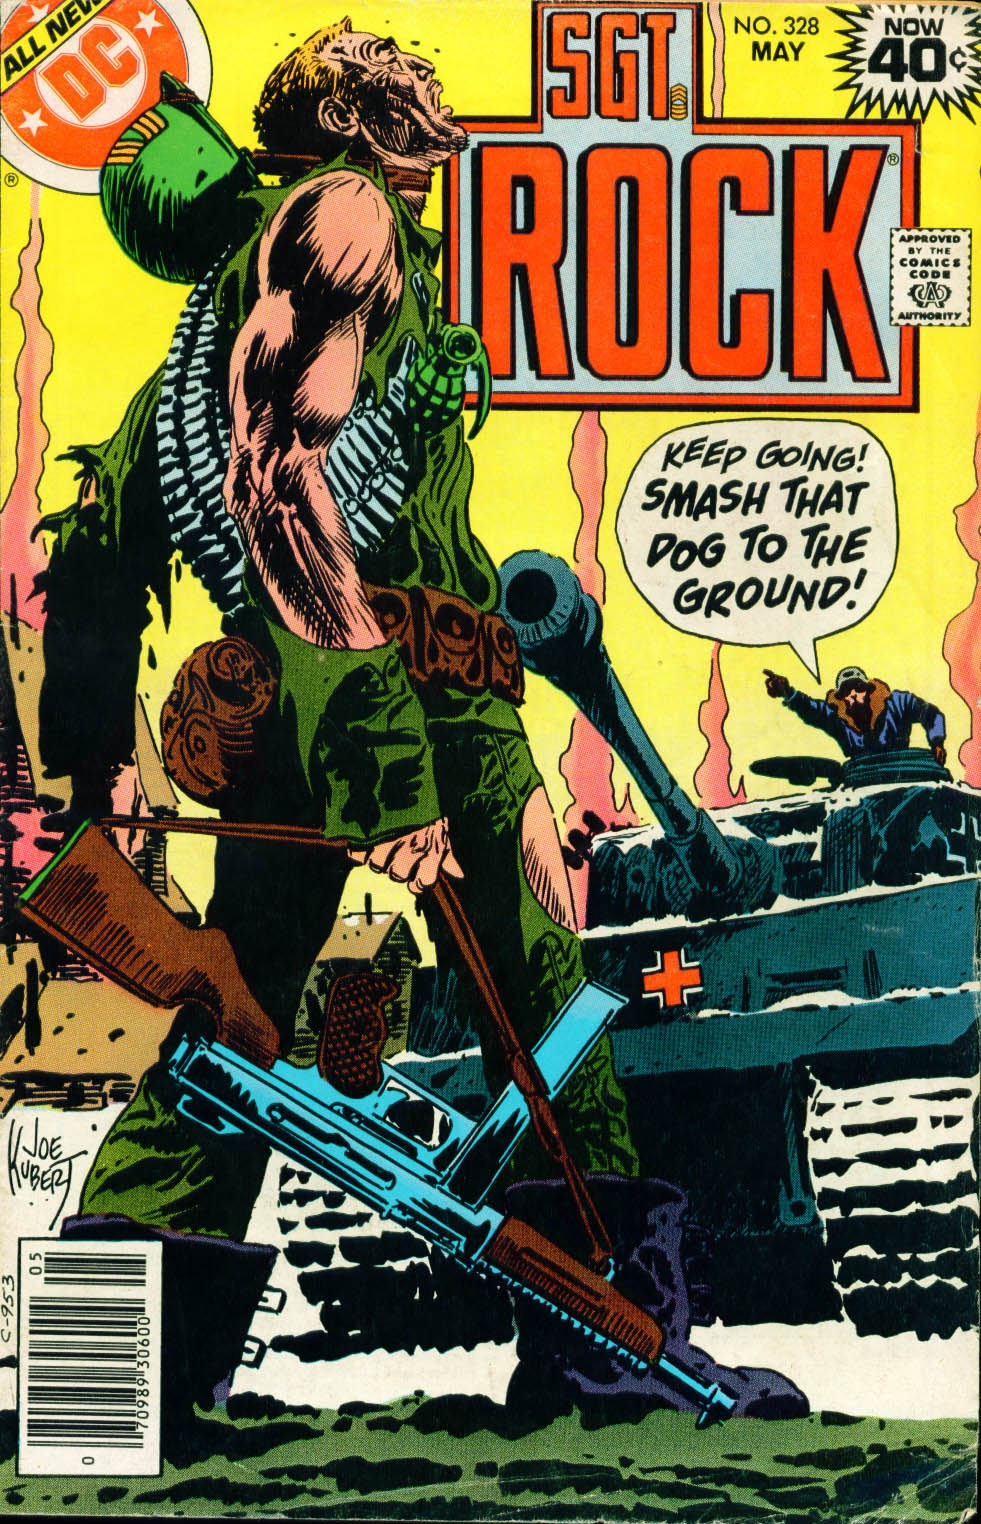 Read online Sgt. Rock comic -  Issue #328 - 1